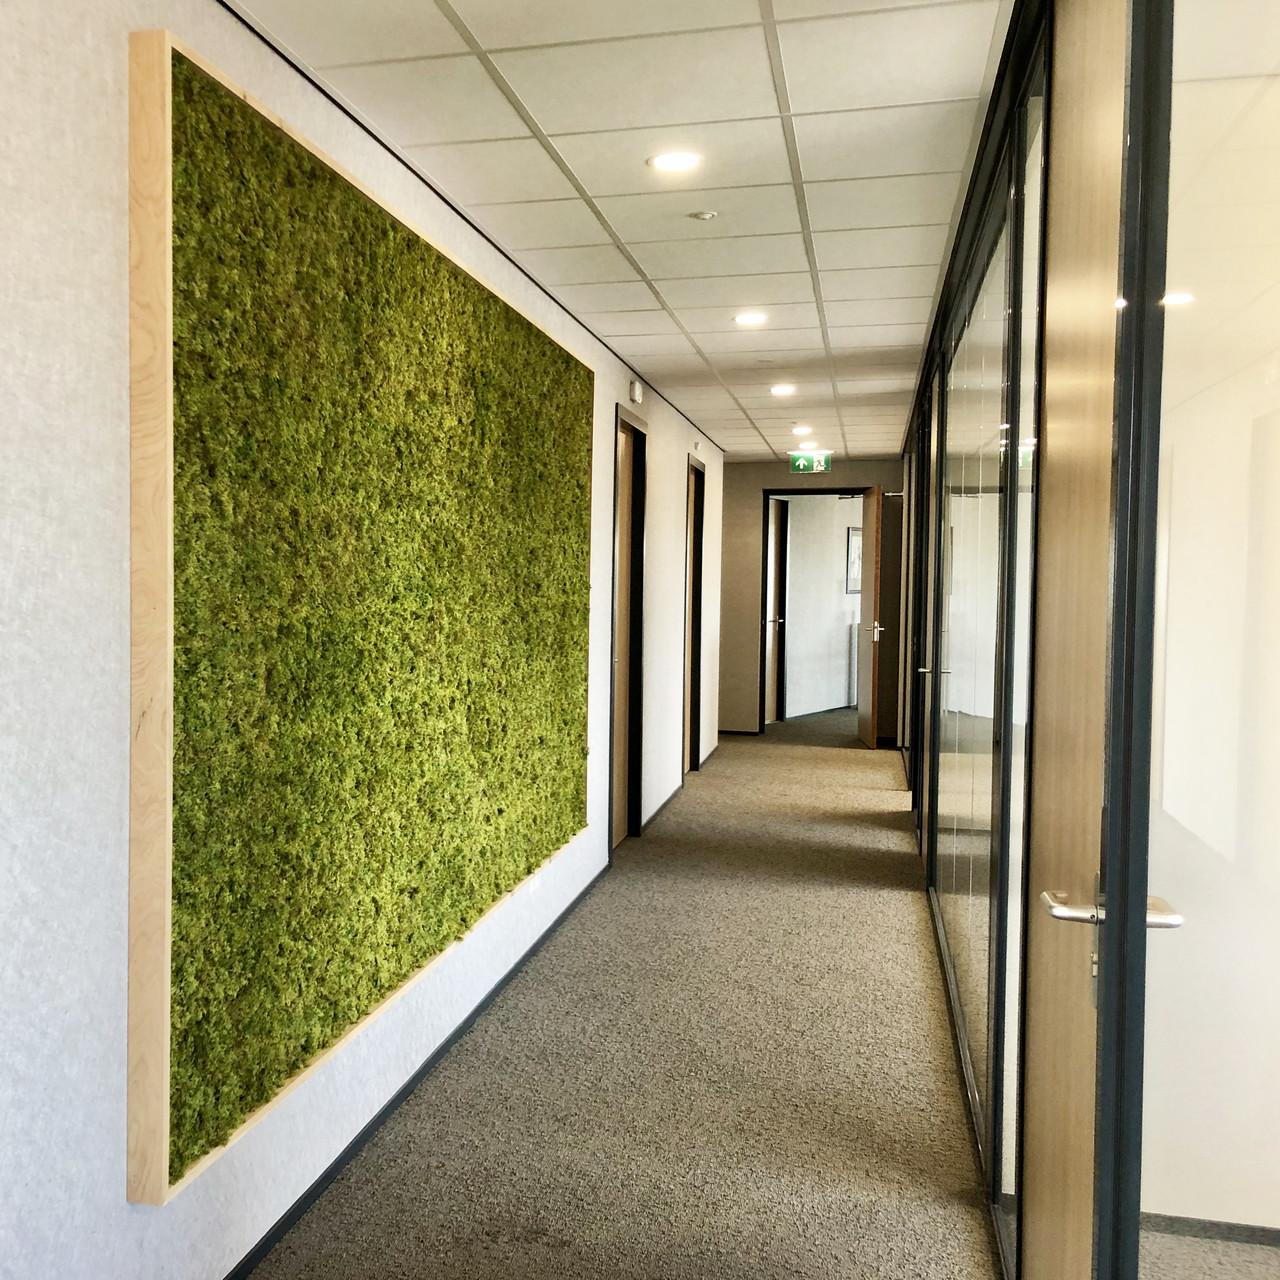 Moswand Groene Wand Kunstmos - moswanden met het mooiste kunstmos